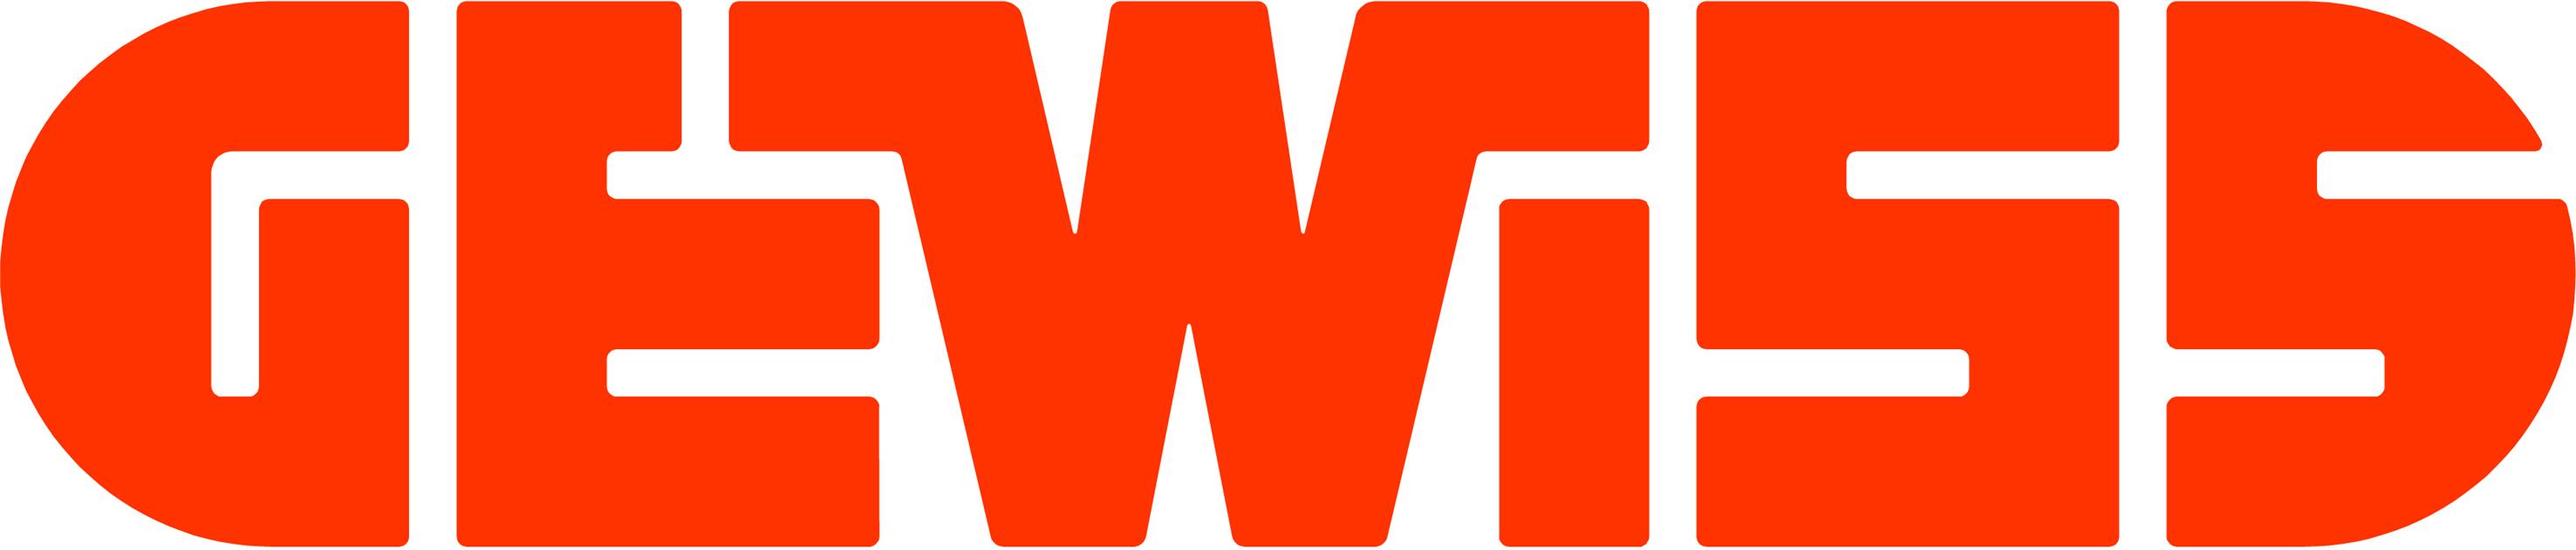 LogoGewissCMYK.jpg